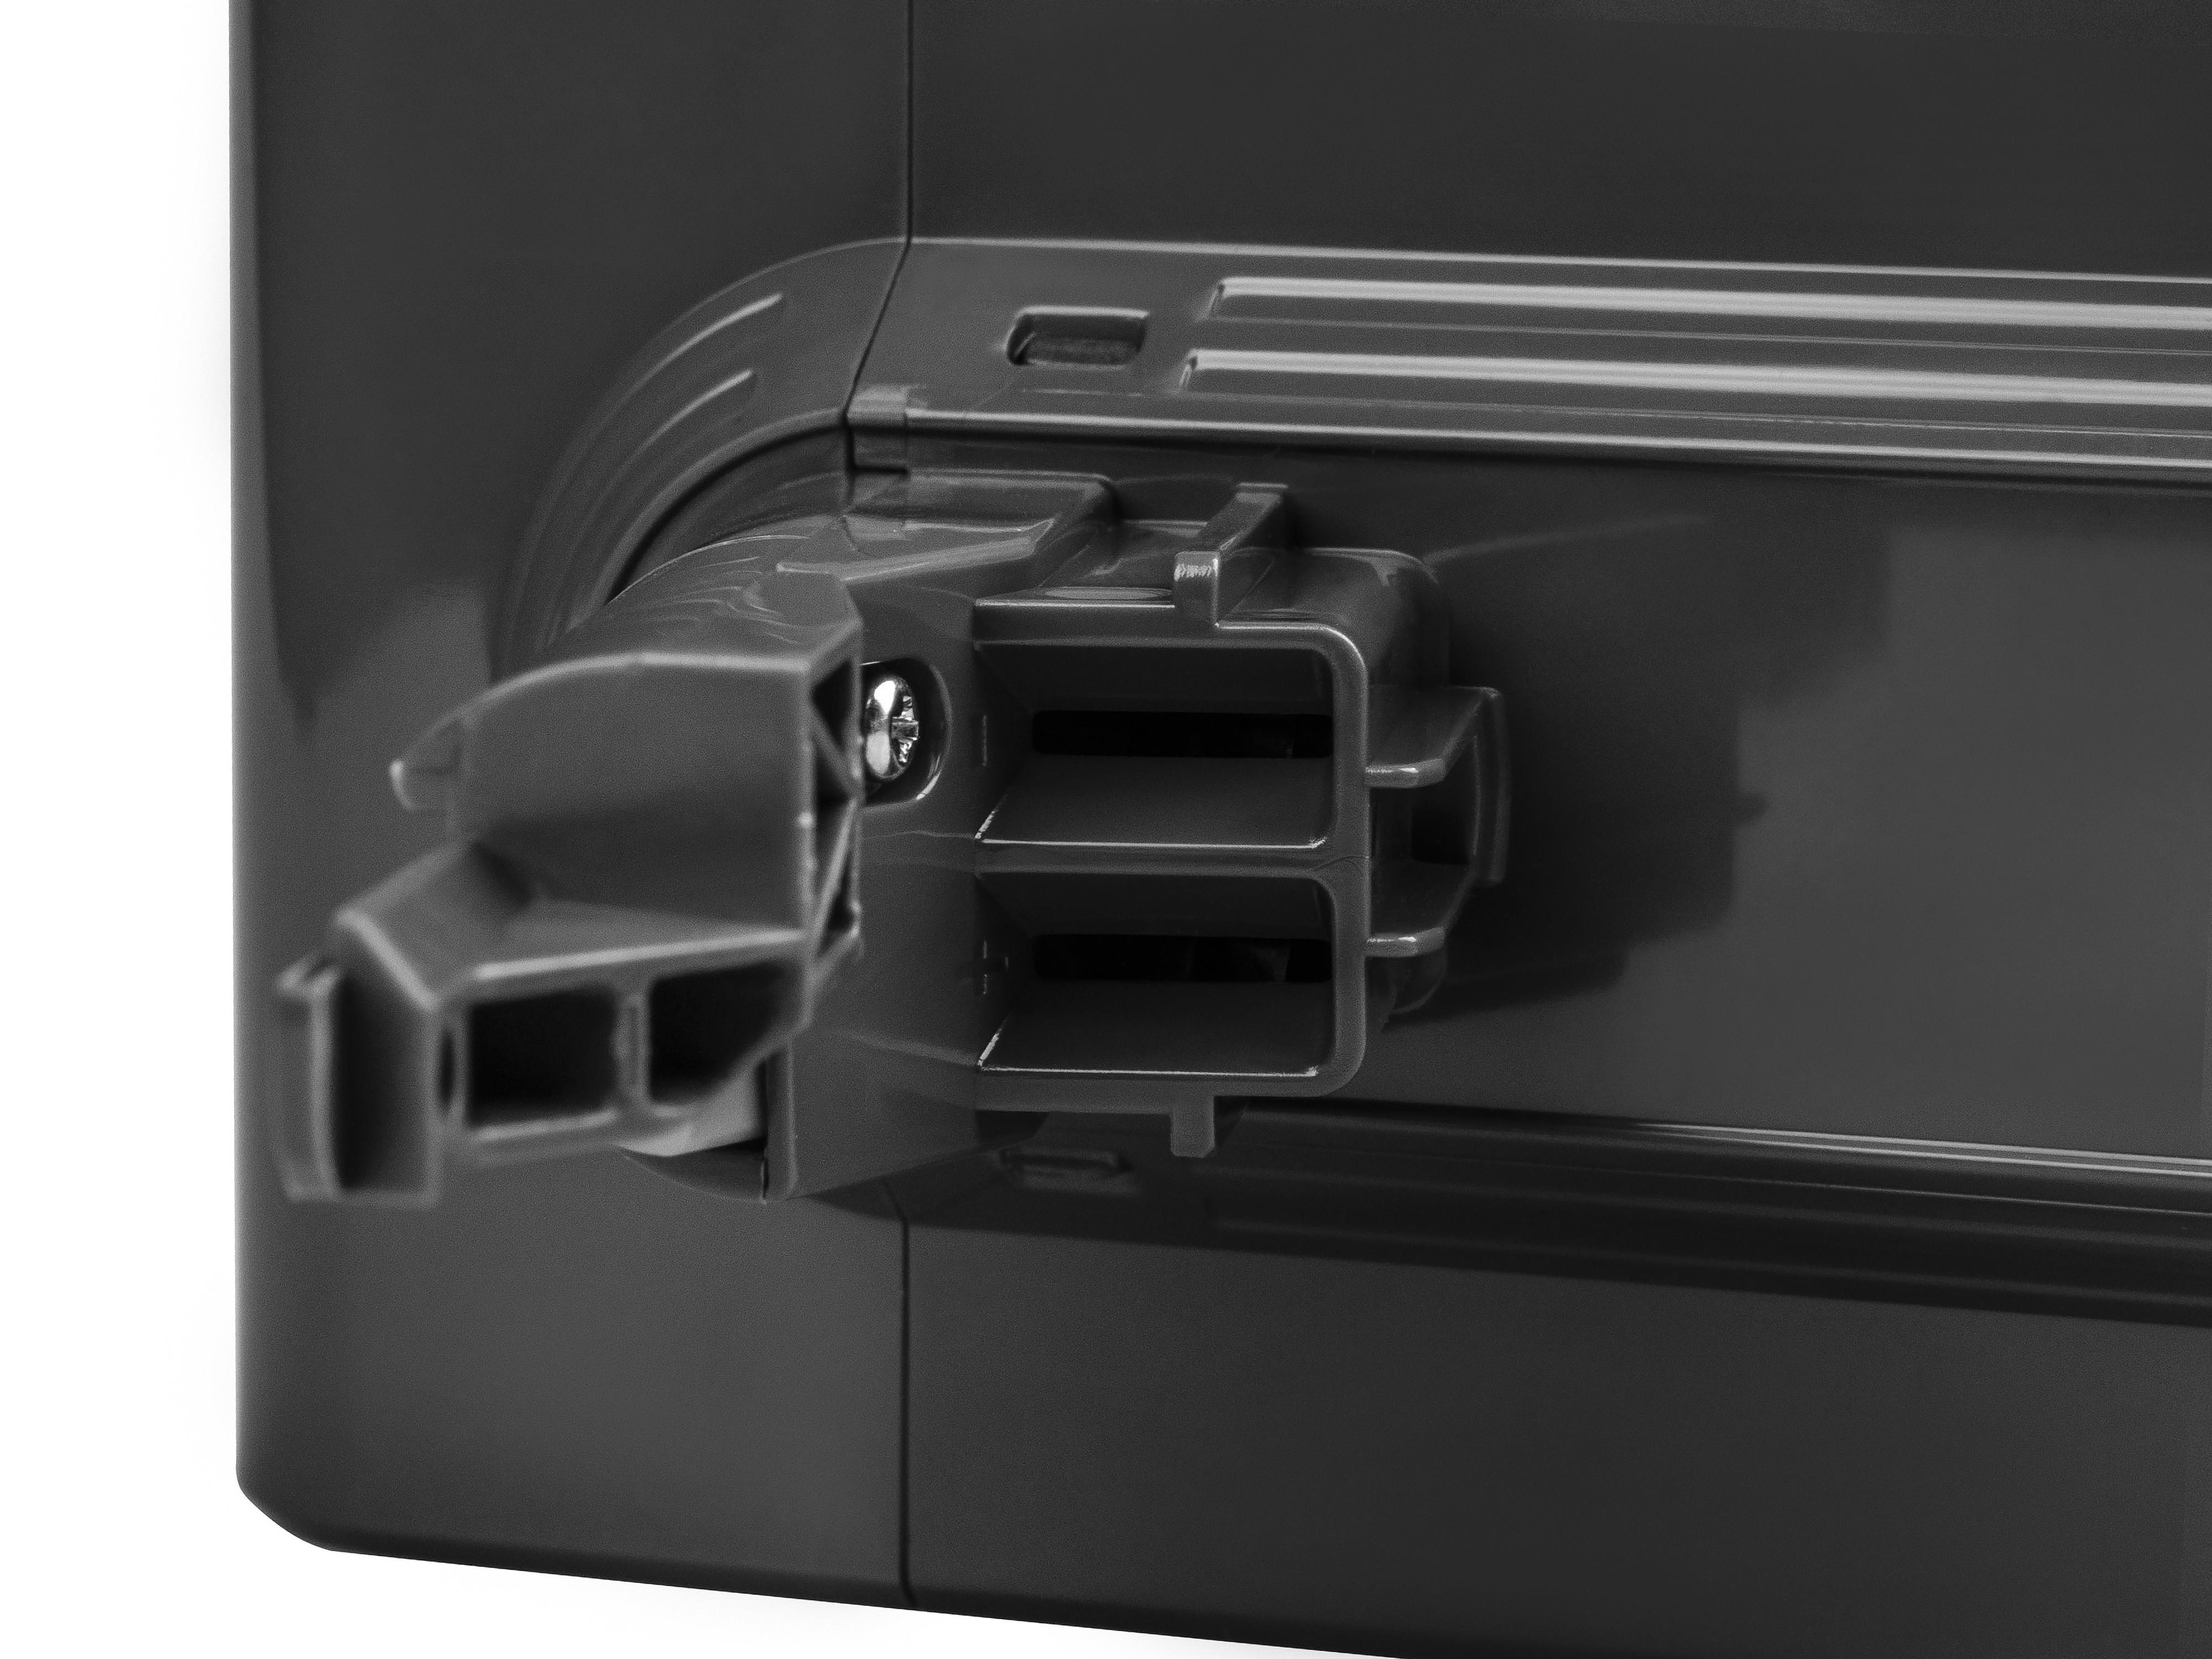 Green Cell Baterie (3Ah 21.6V) 968670-02 968670-03 968670-06 SV11 pro Dyson V7 Animal Pro+ Absolute Car+Boat Trigger